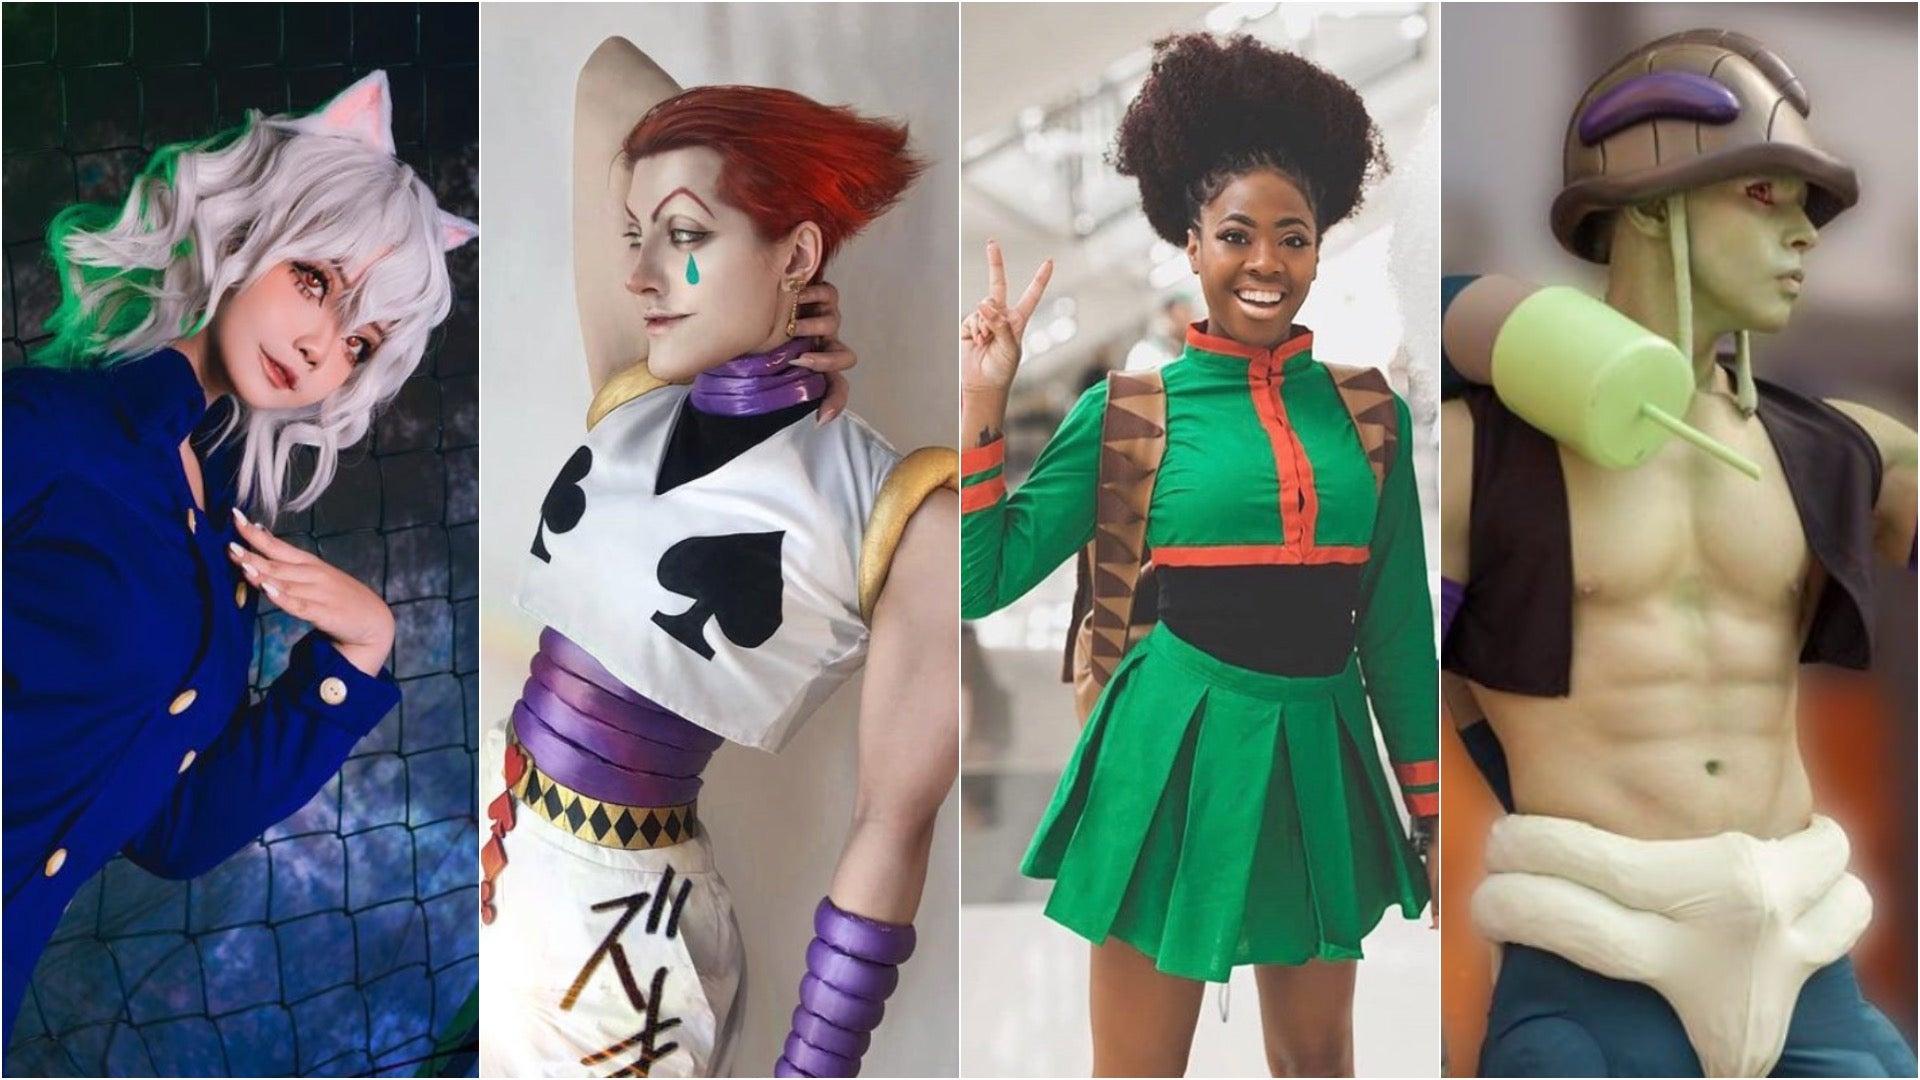 Left to right: Yukaoni_, Villain Lady, Tatted Poodle, Goukicosplay. Photos Courtesy Instagram.